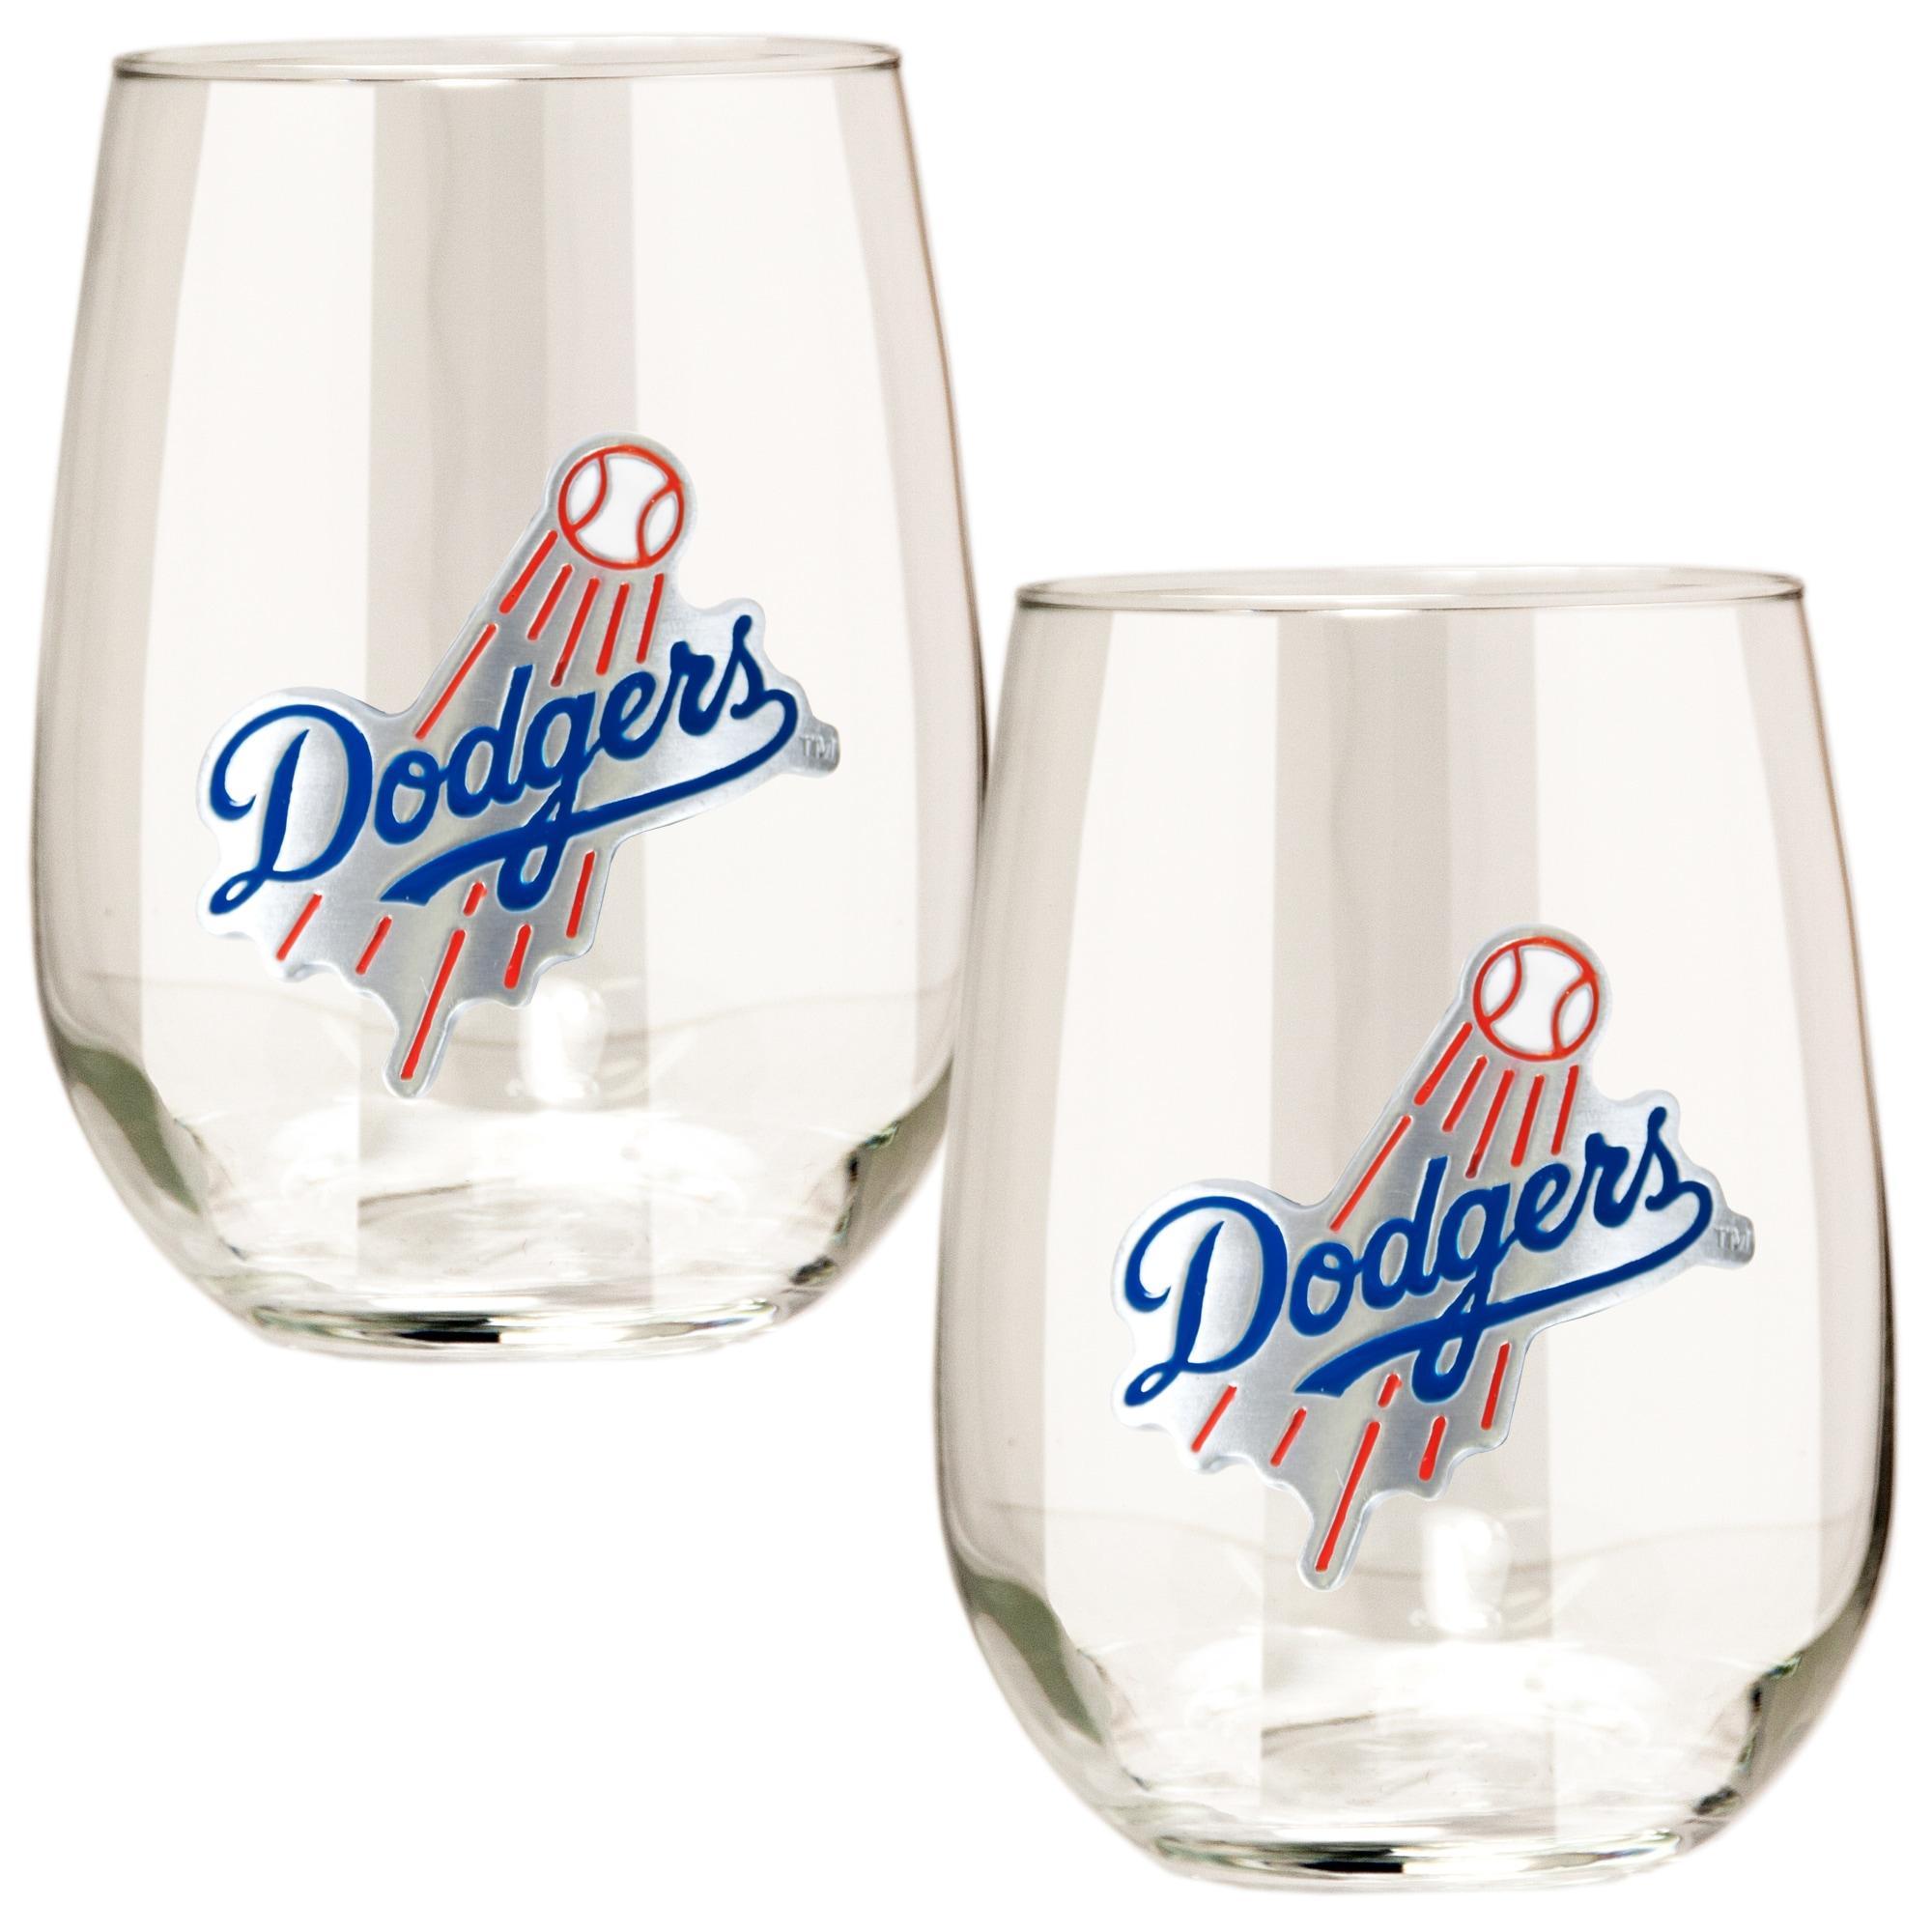 Los Angeles Dodgers Stemless Wine Glass Set